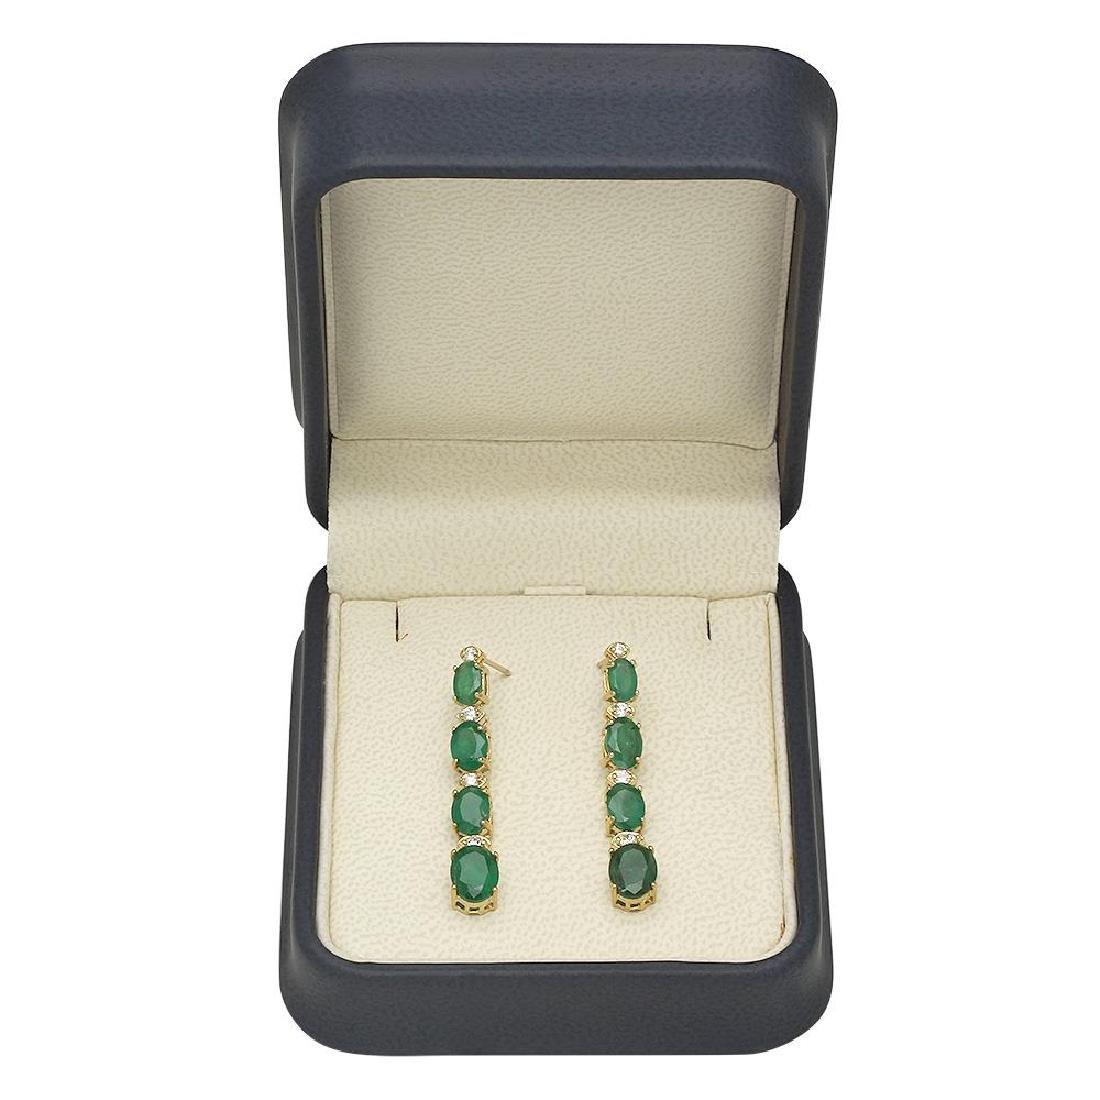 14K Gold 5.55ct Emerald 0.33 Diamond Earrings - 2